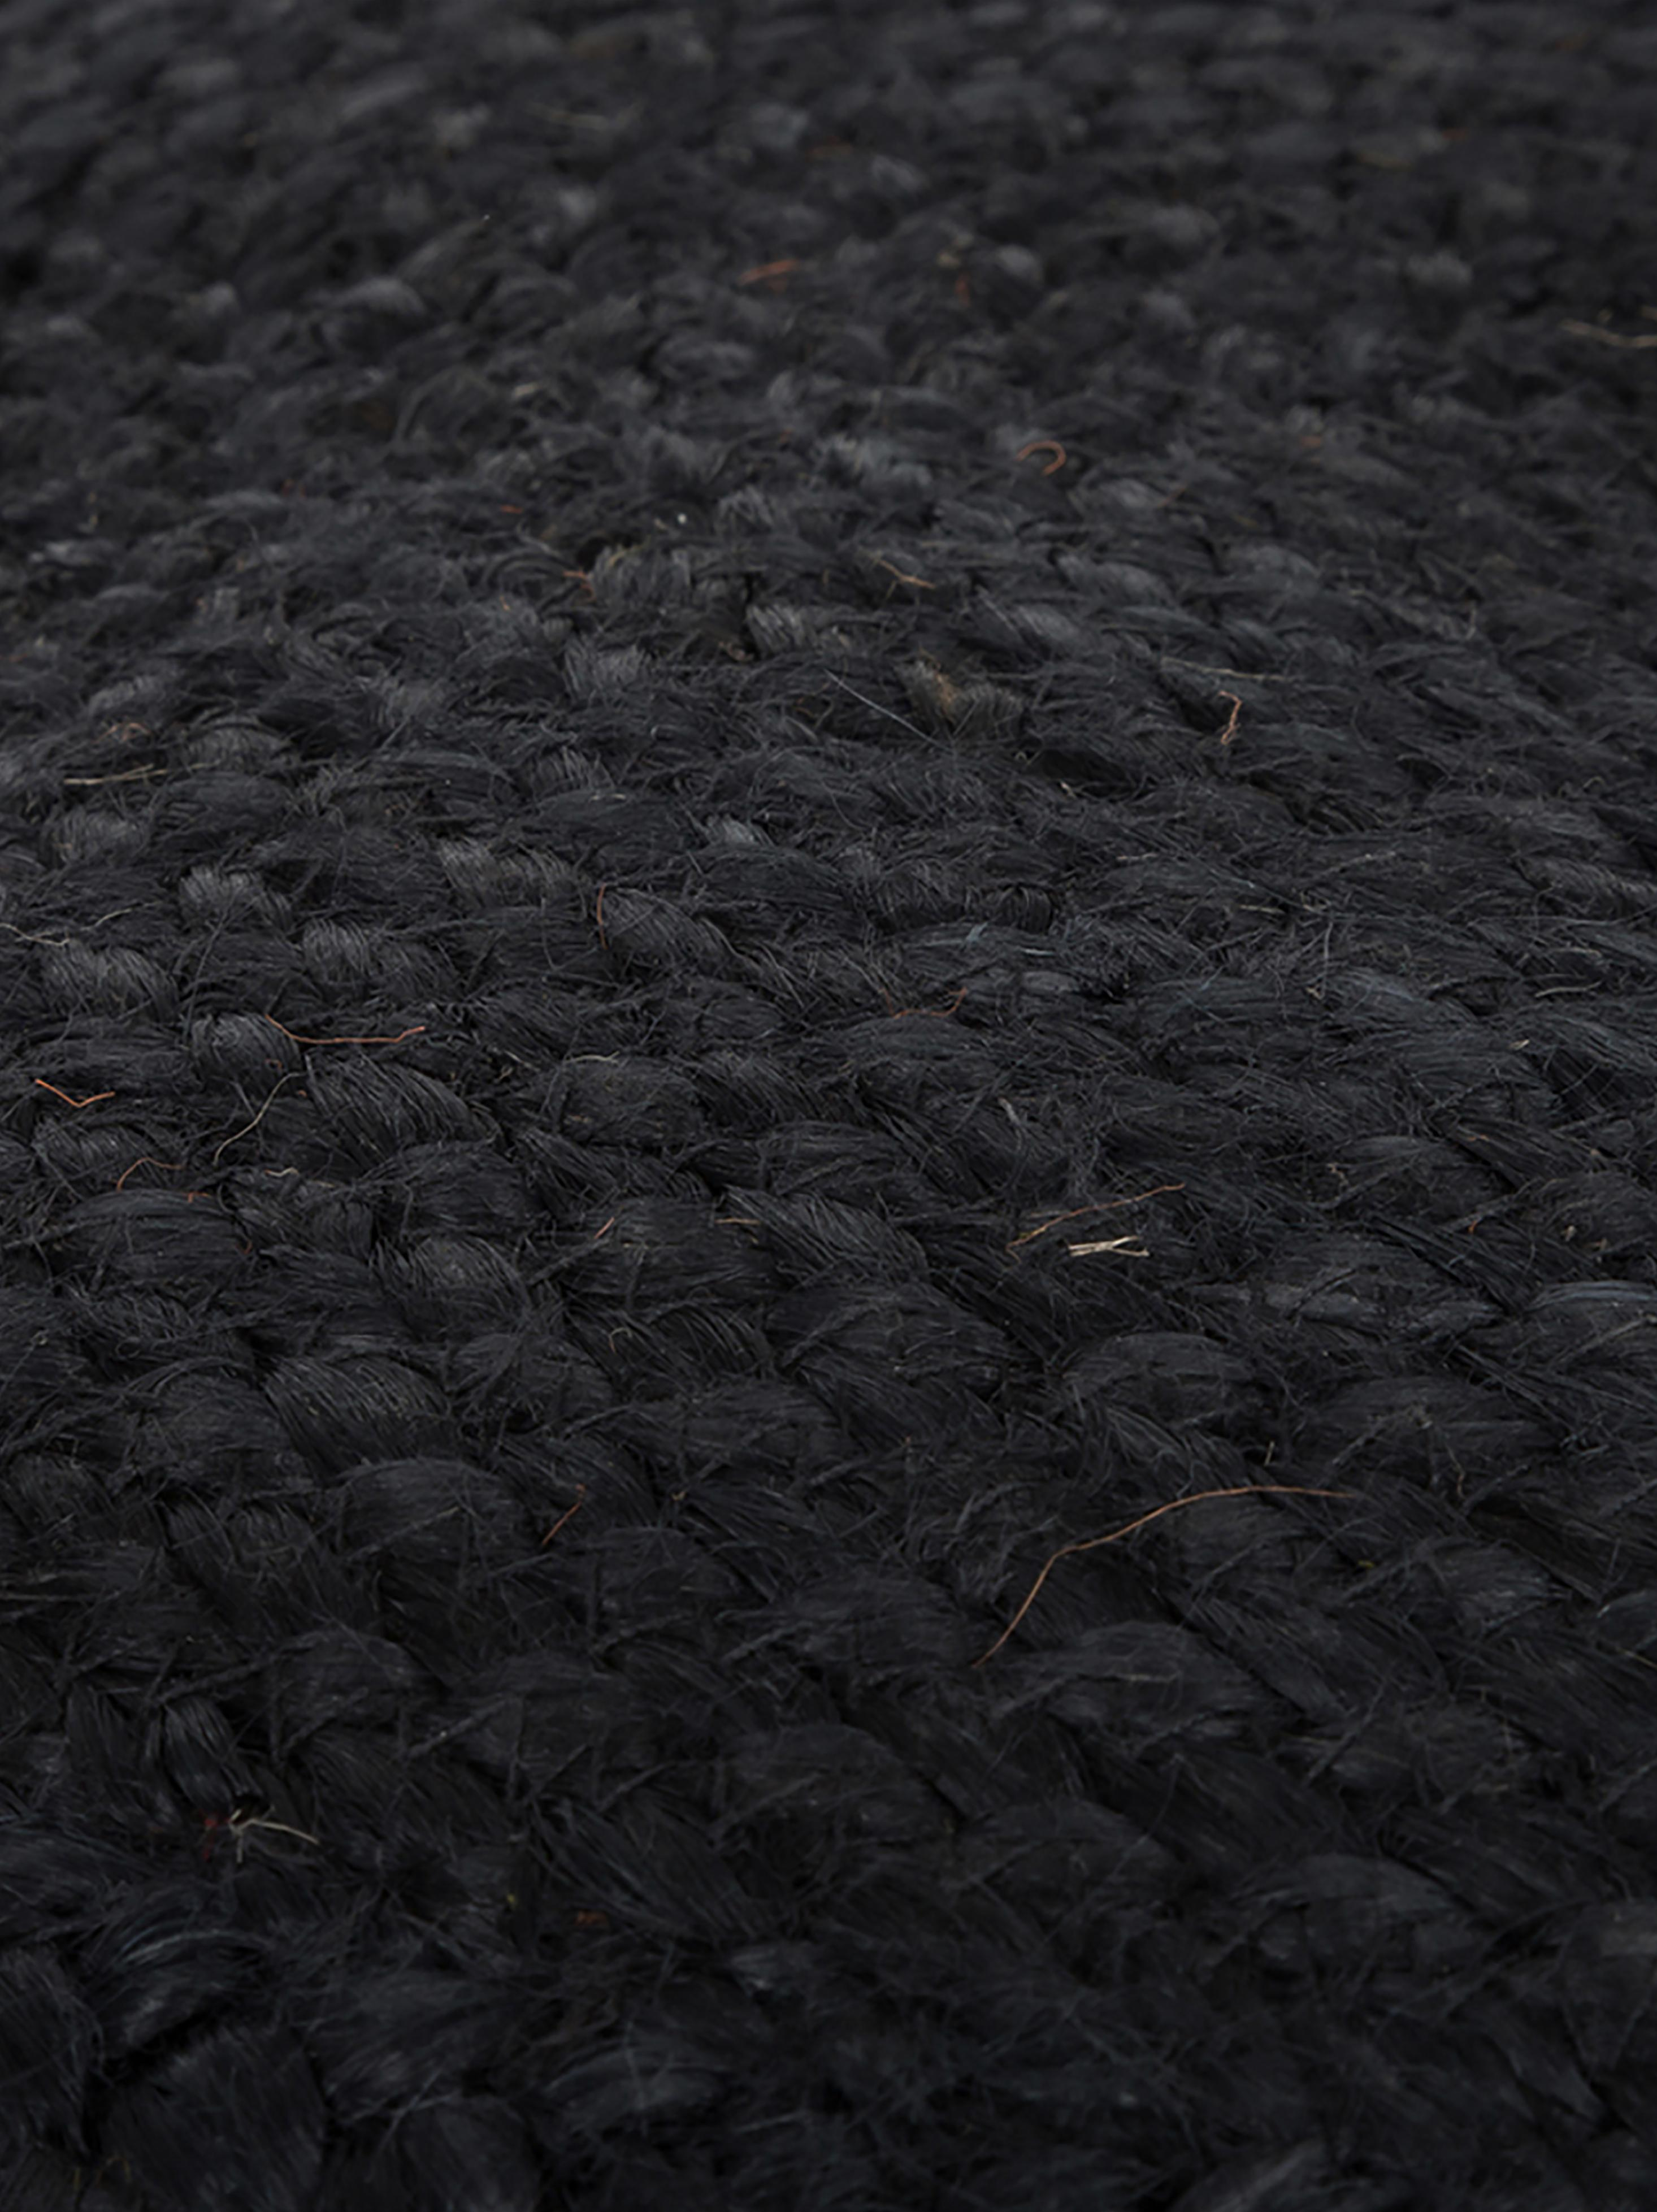 Handgefertigter Pouf Bono aus Jute, Bezug: Jute, Beige, Schwarz, Ø 50 x H 36 cm